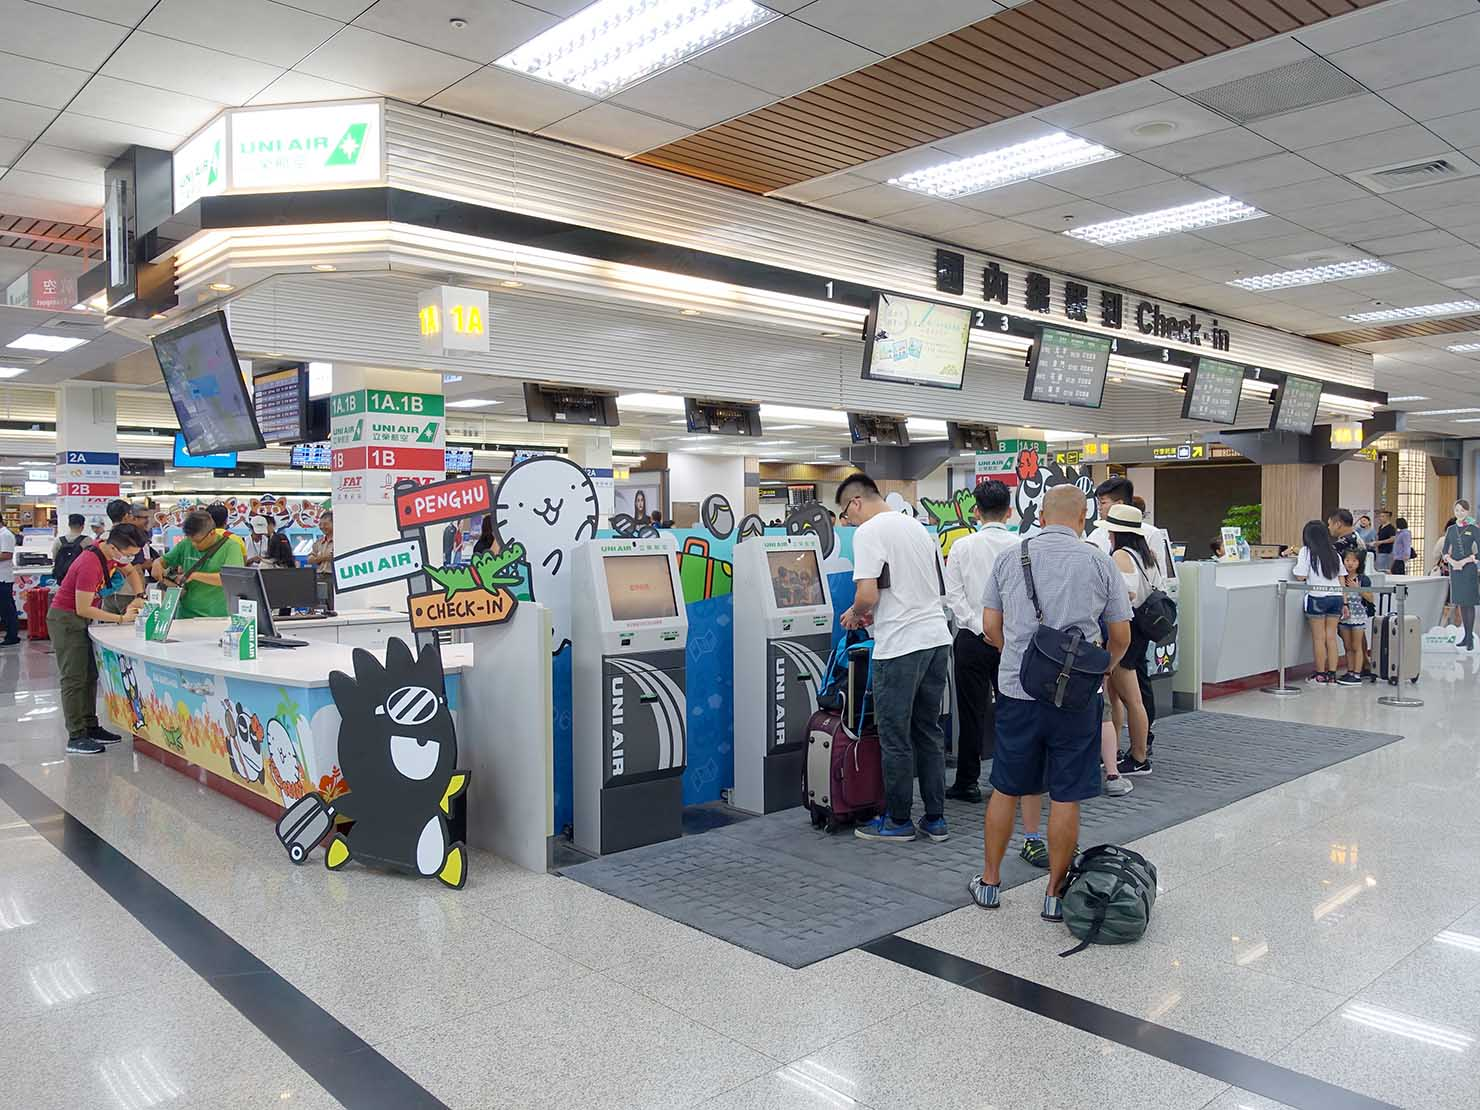 KKday外国人限定「花蓮・太魯閣(タロコ)日帰りツアー」台北・松山空港にある立榮航空(UNI AIR)のチェックインカウンター